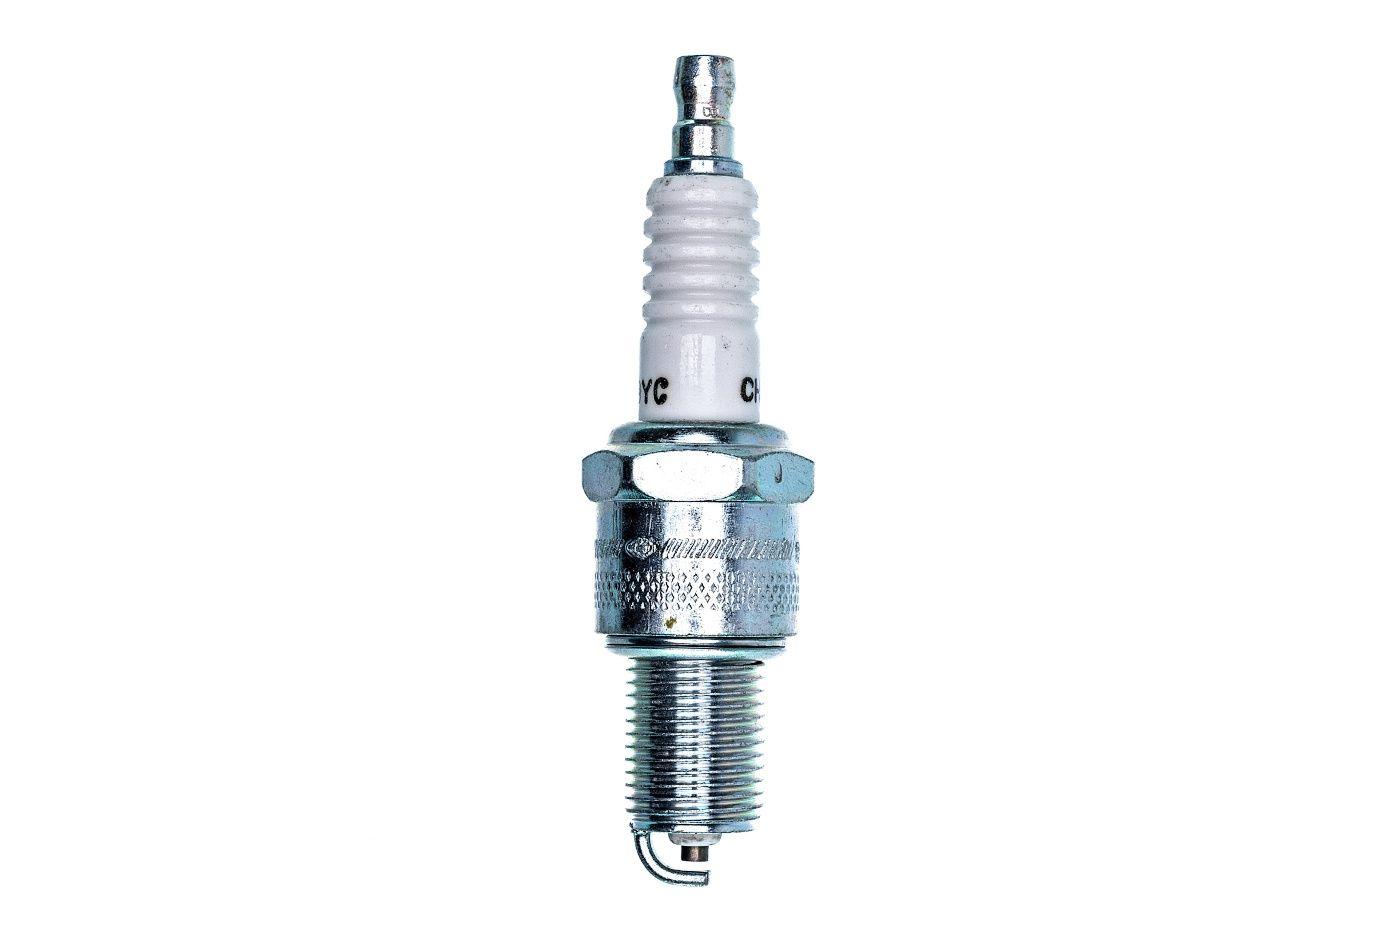 Zapalovací svíčka CHAMPION N9YC HONDA - LR17YC